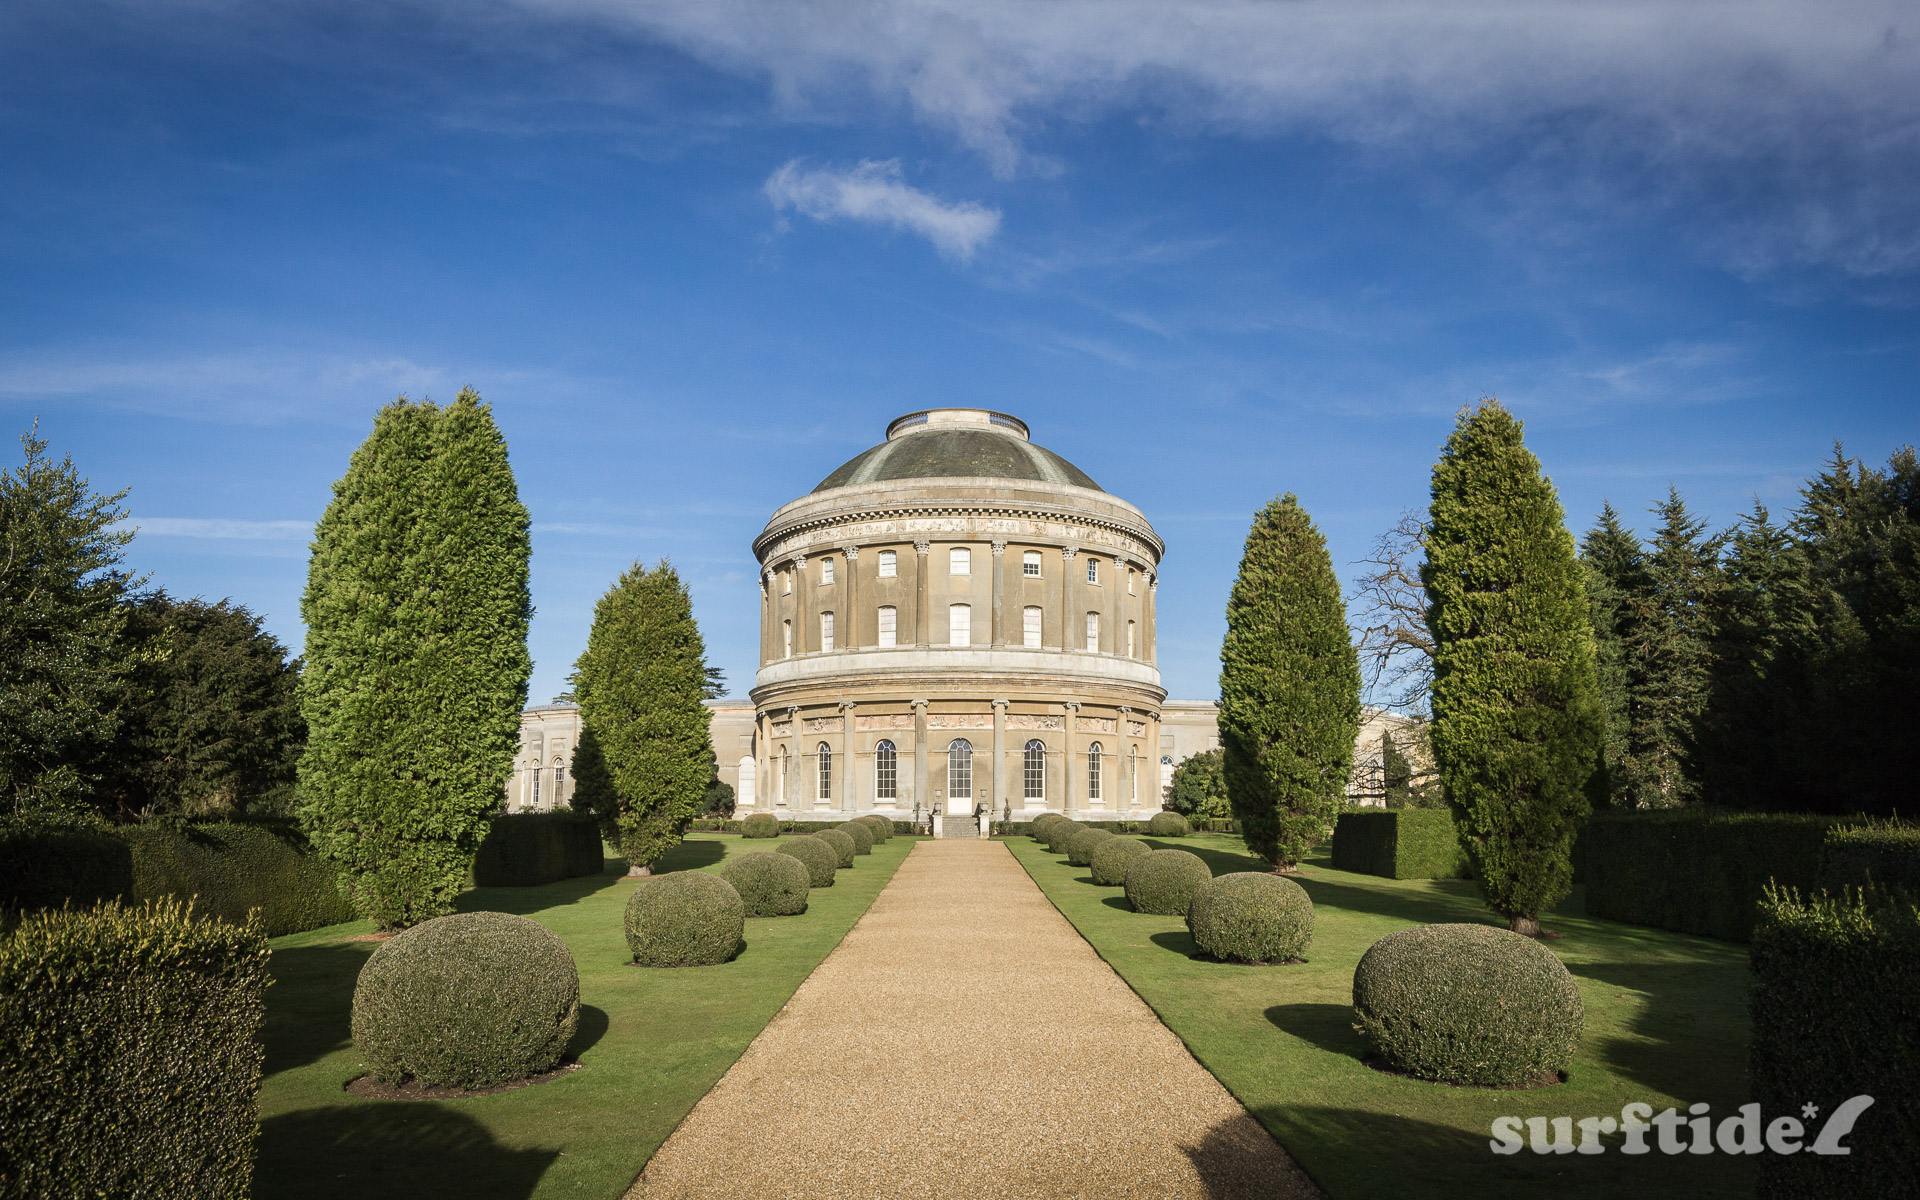 The Rotunda, Ickworth House & Gardens